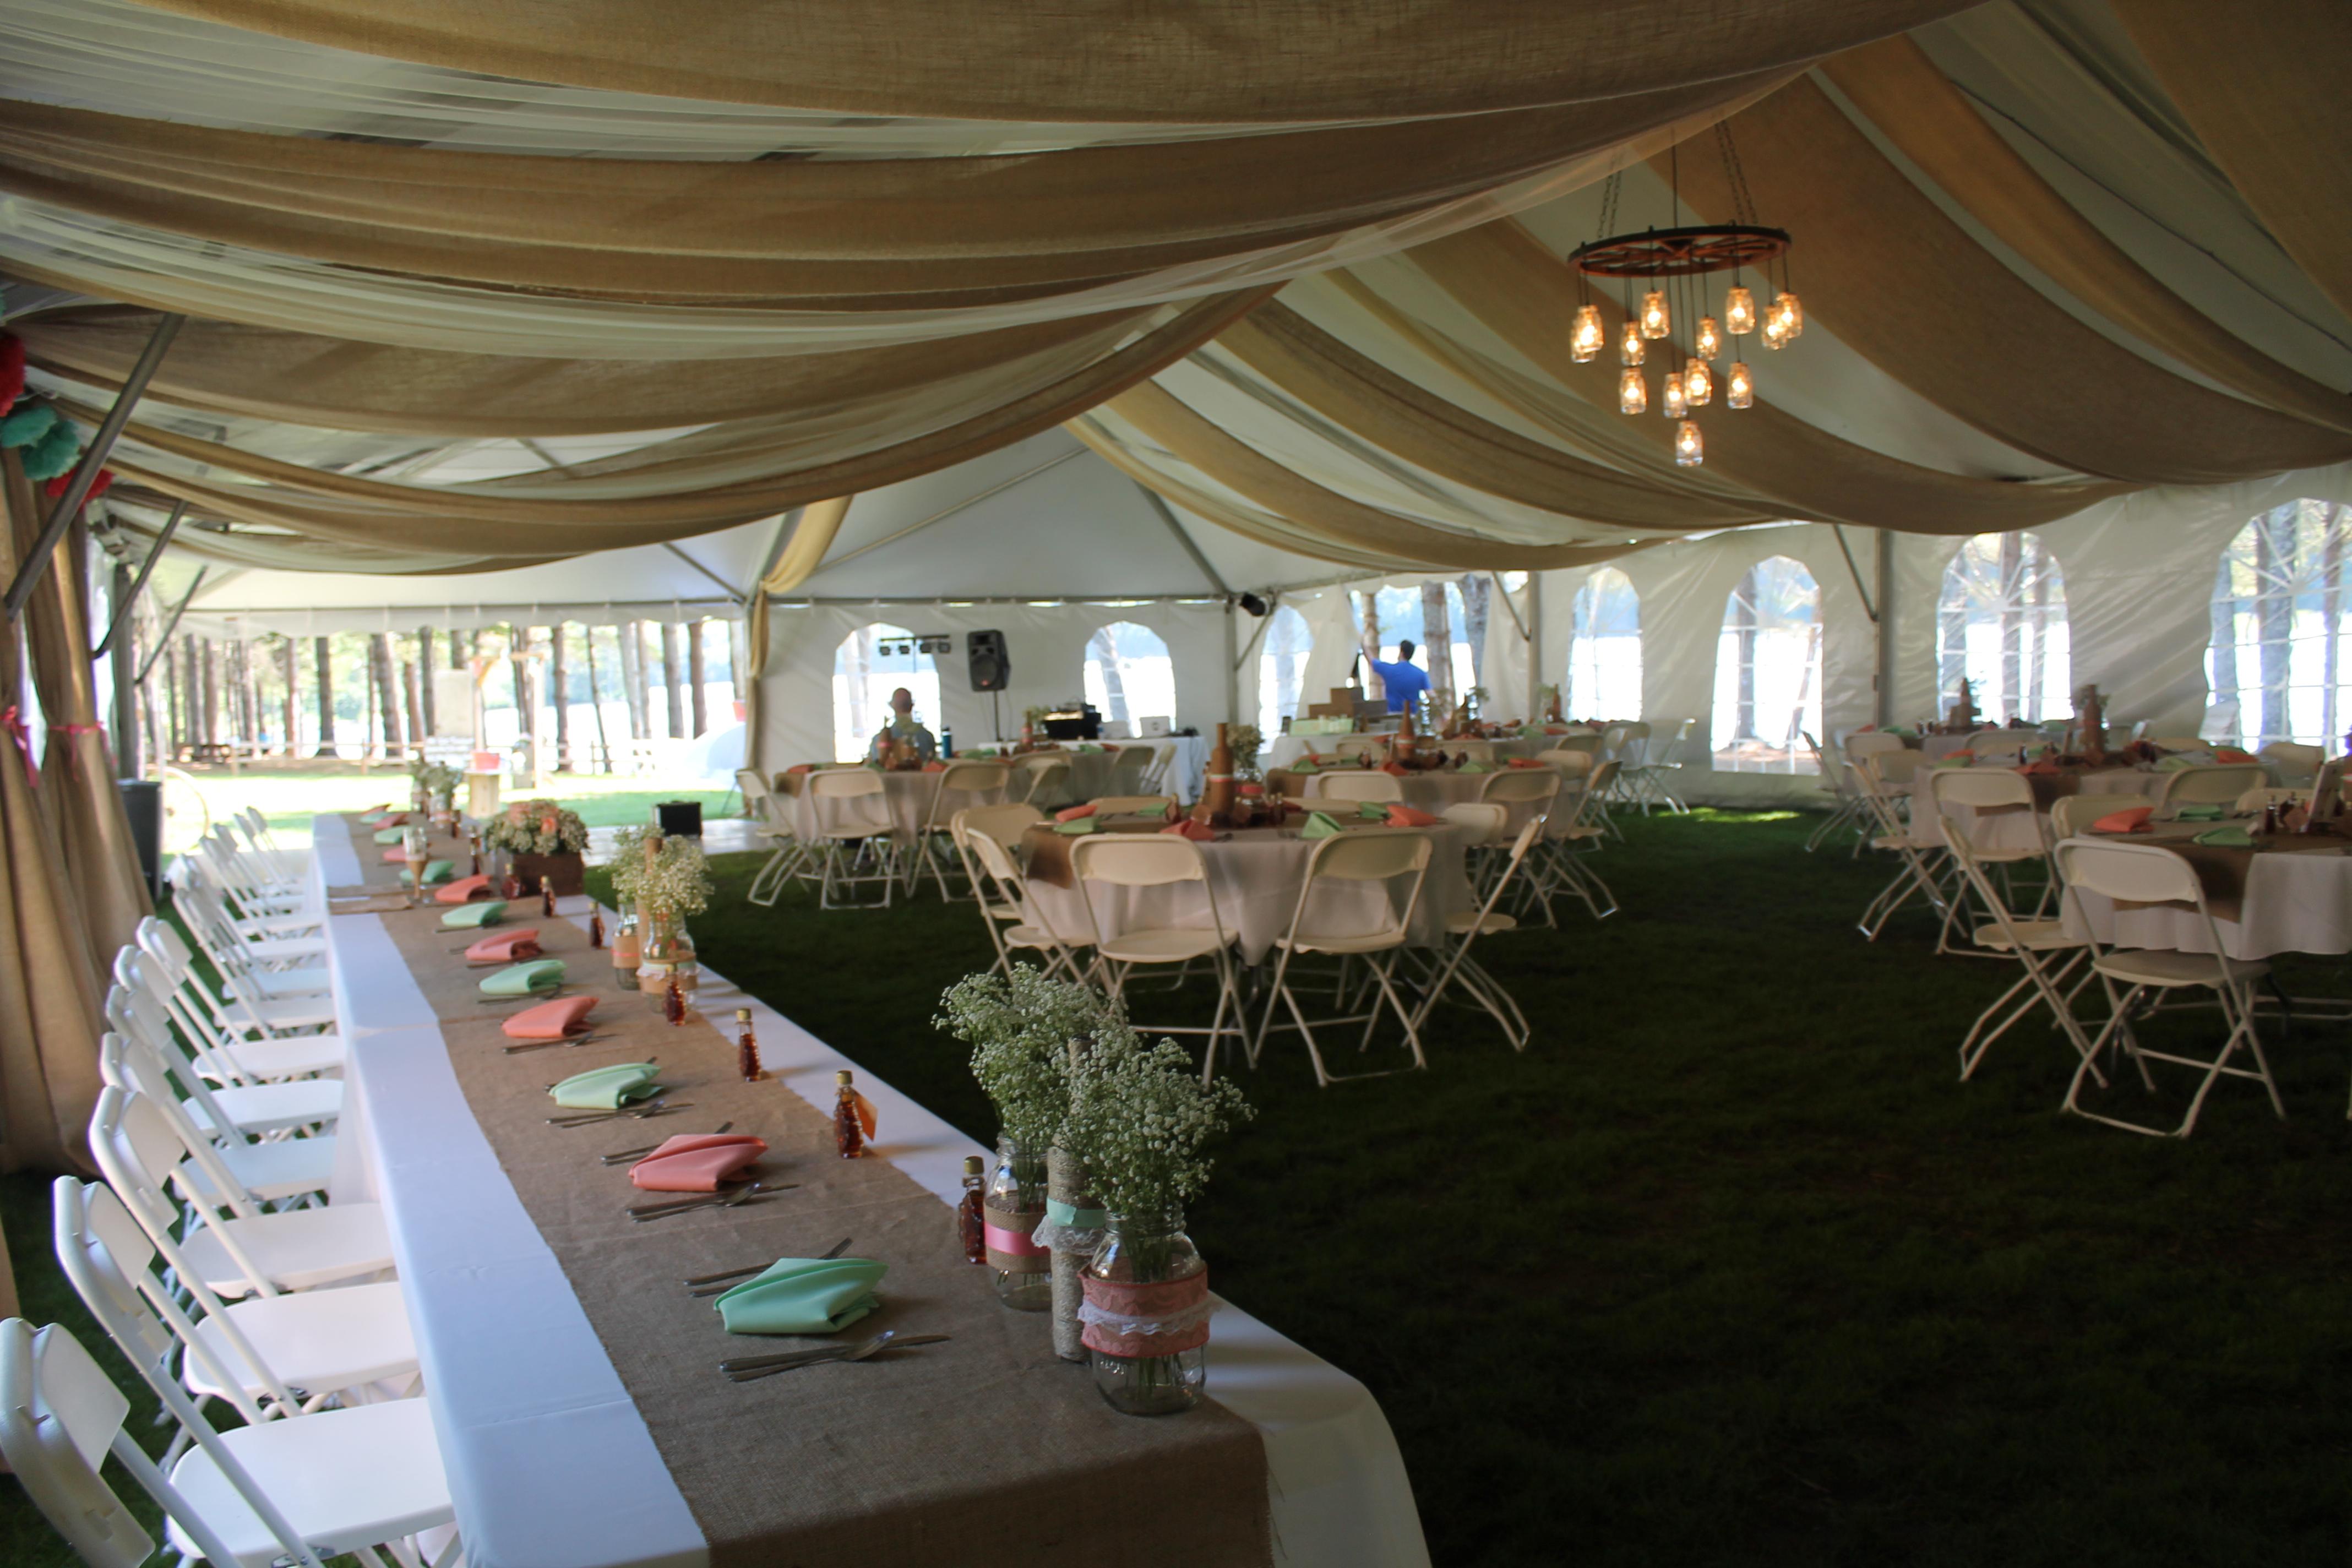 Custom Tent Drapery and Lighting